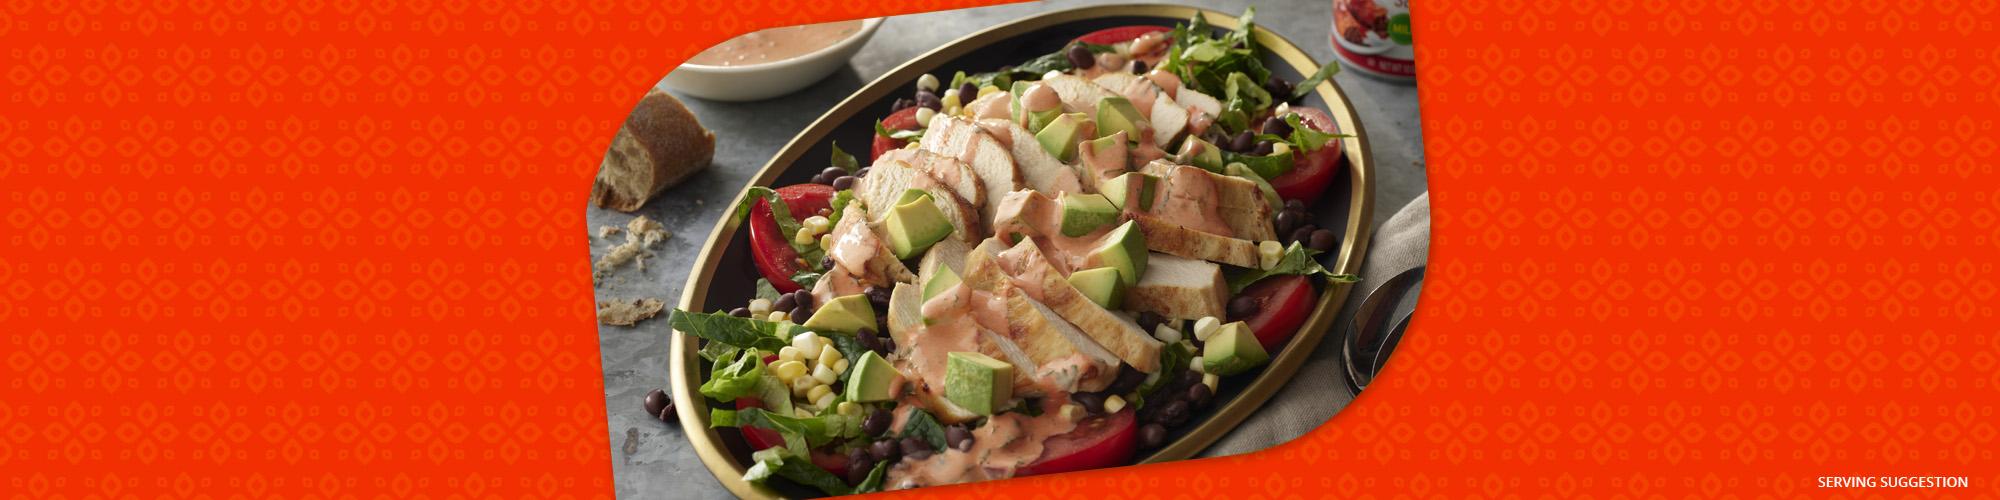 Salsas chicken salad with enchilada sauce dressing